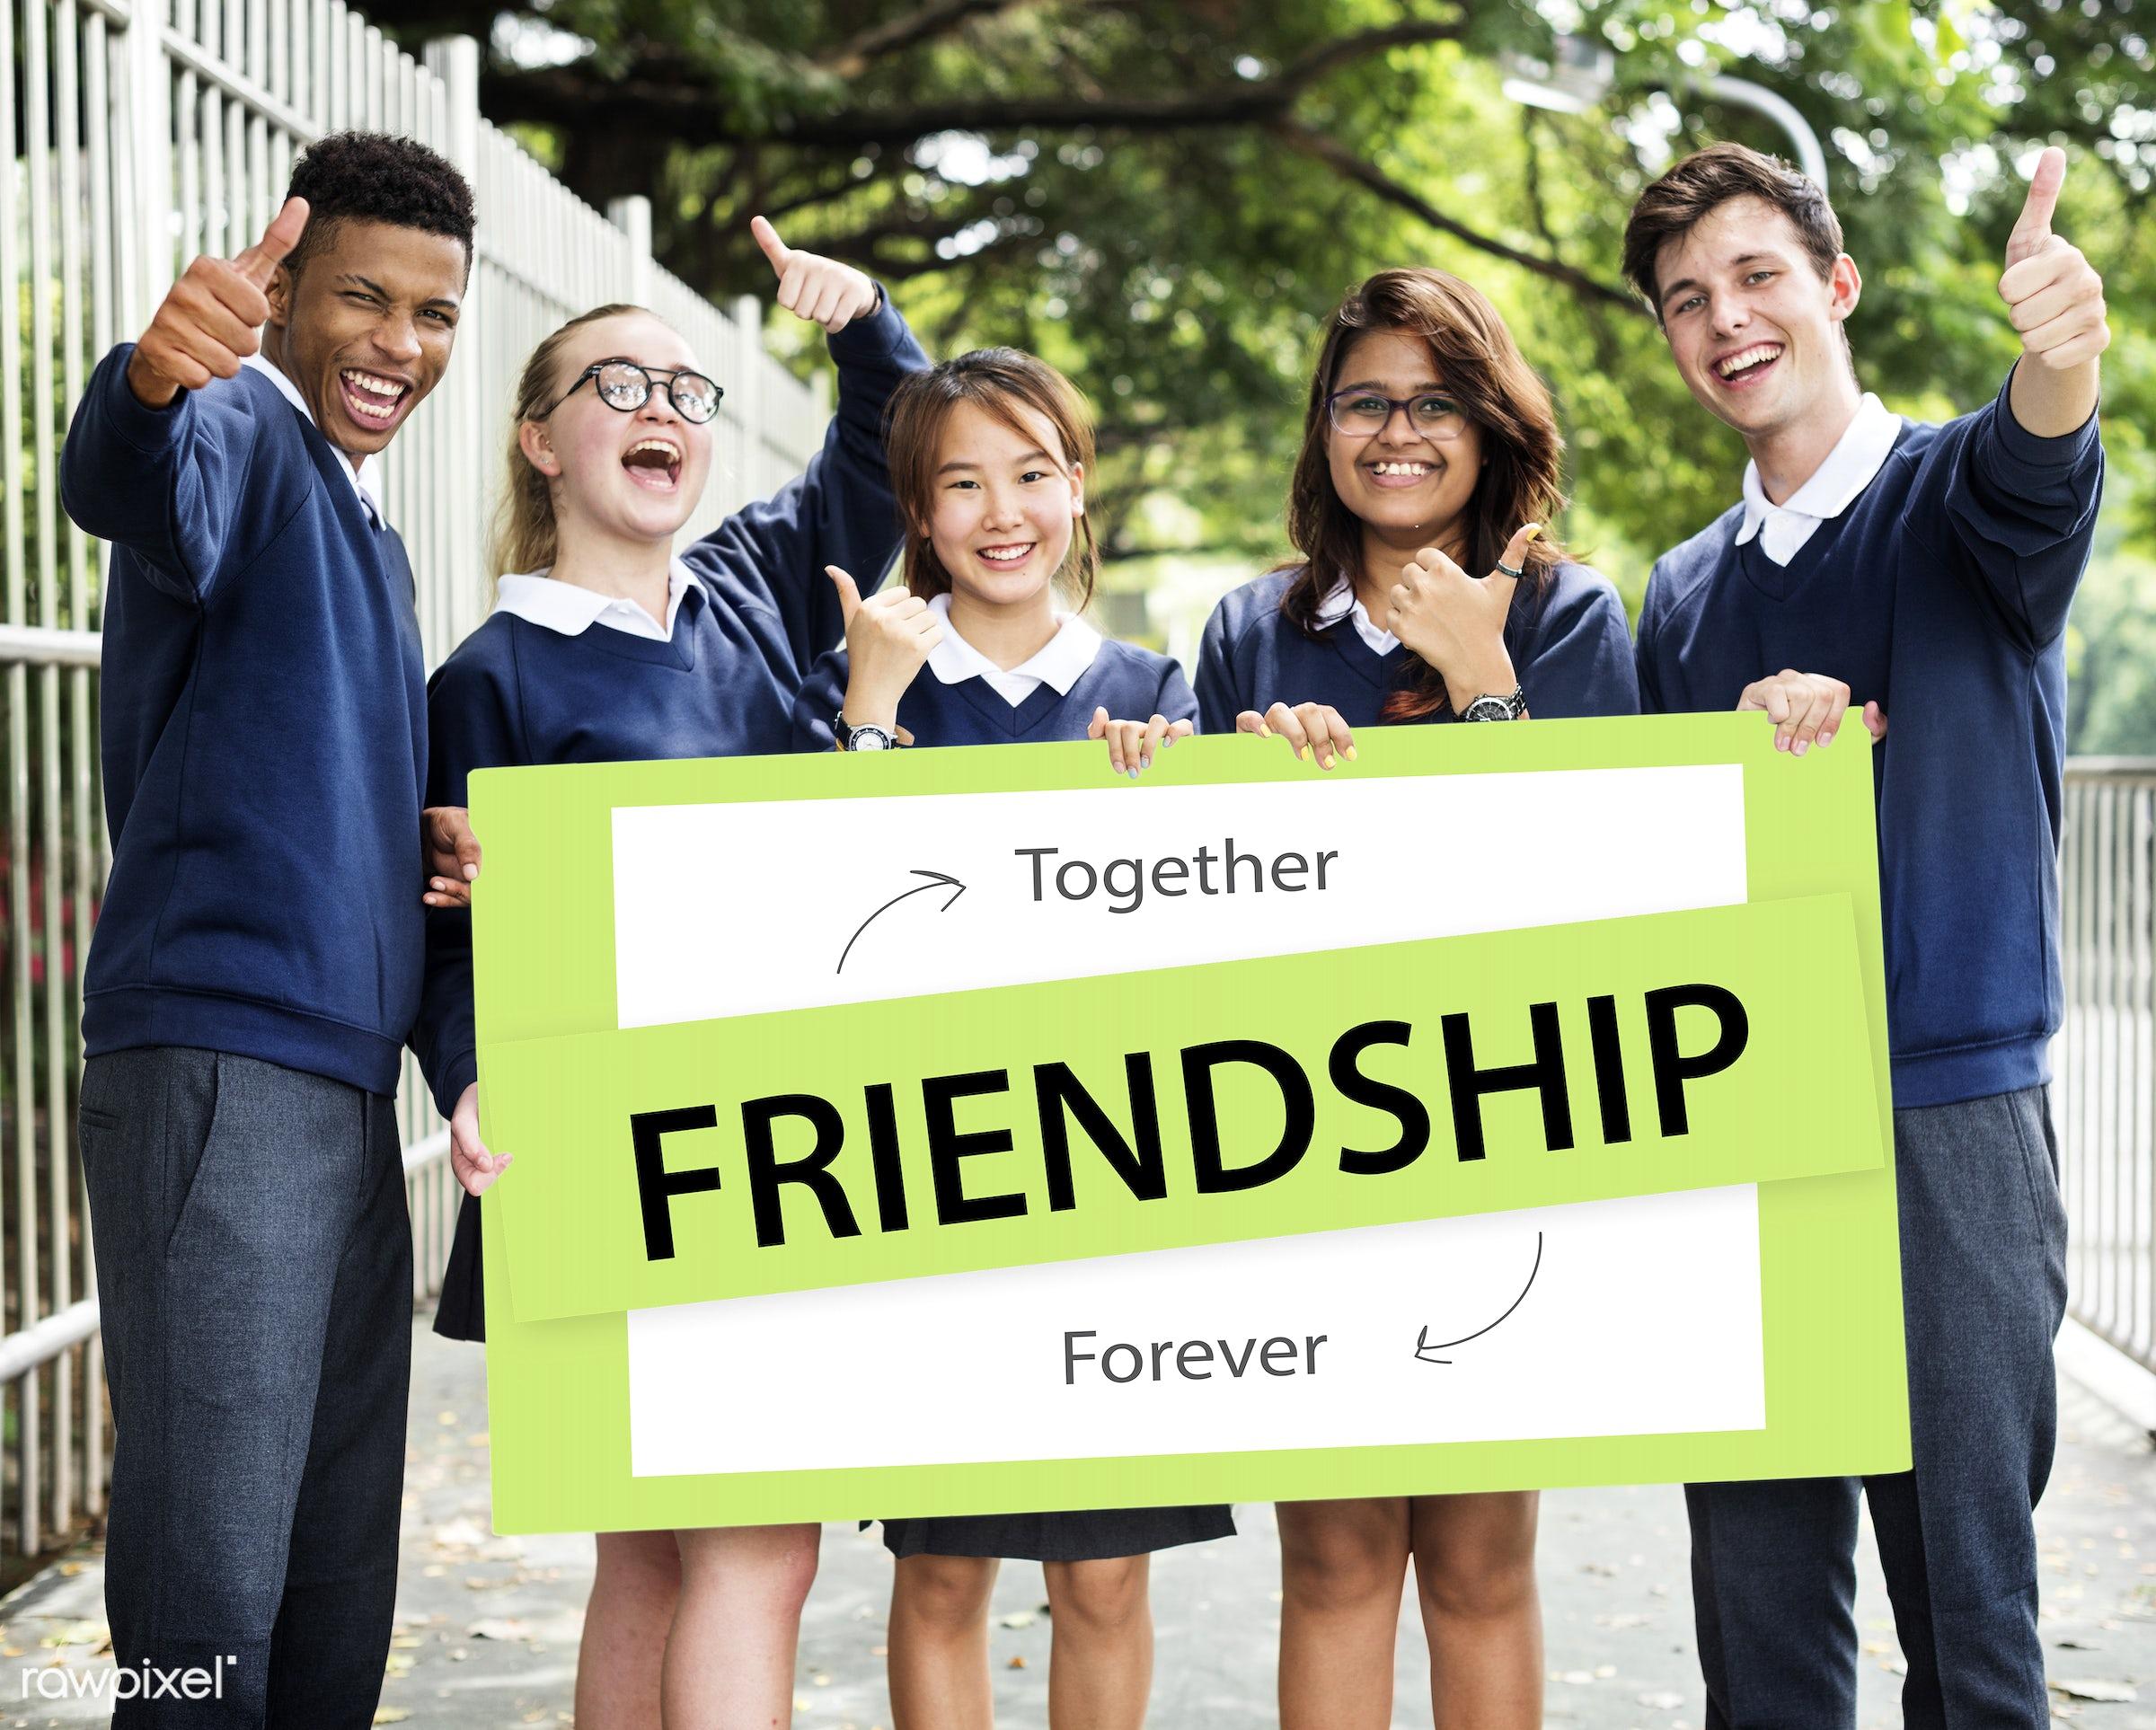 caucasian, african descent, asian, care, community, cooperation, diversity, enjoyment, forever, friends, friendship, fun,...